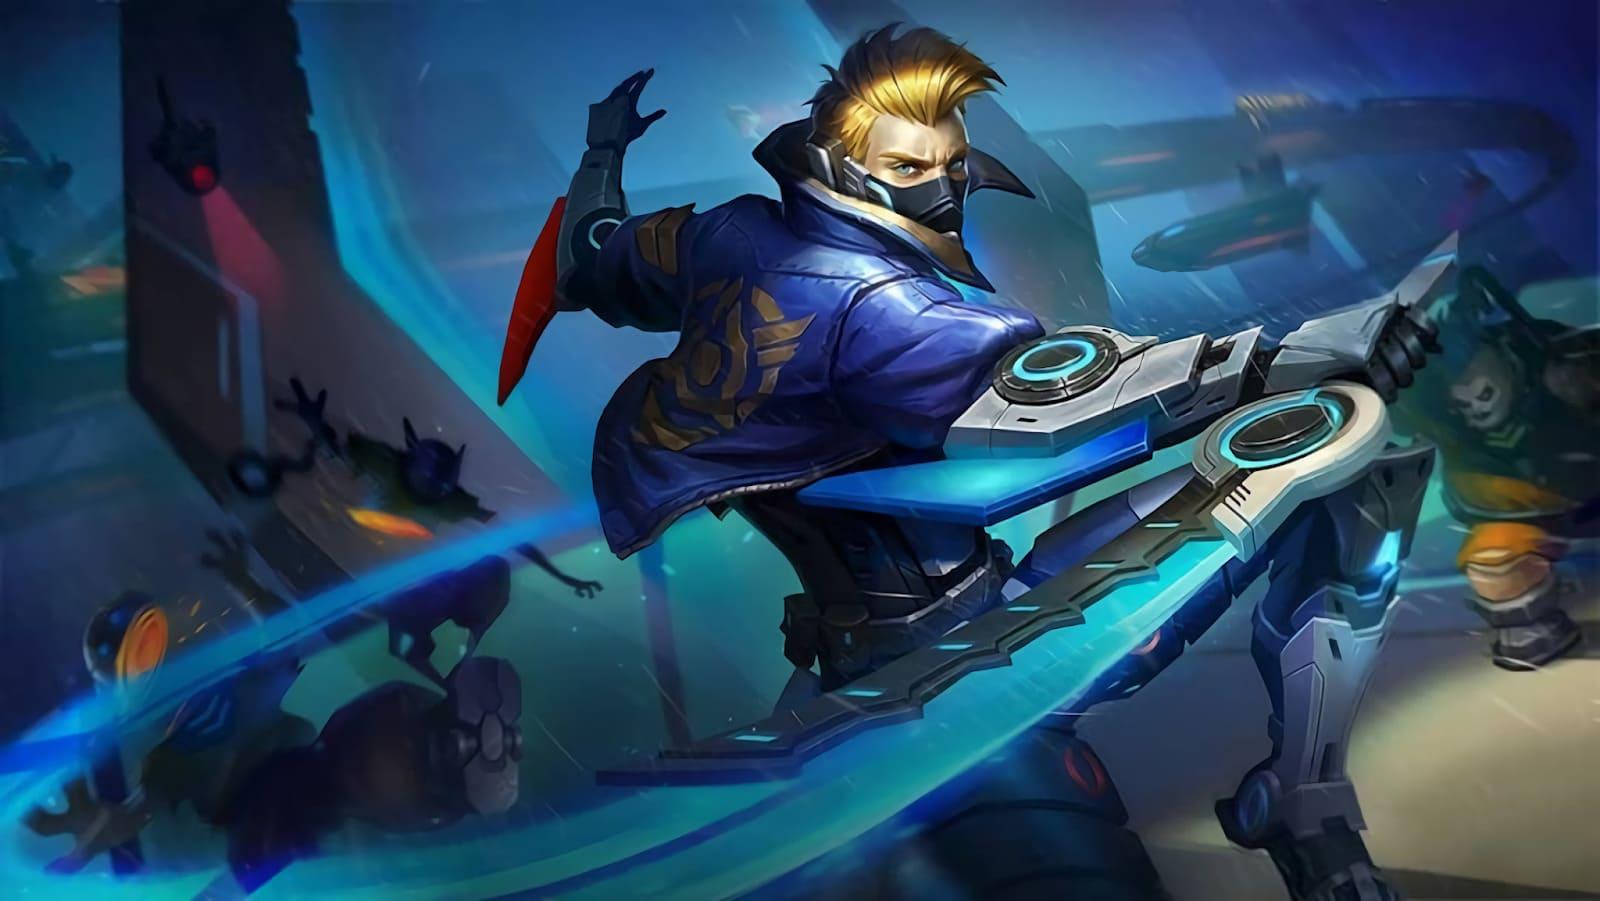 Wallpaper Hayabusa Future Enforcer Skin Mobile Legends HD for PC